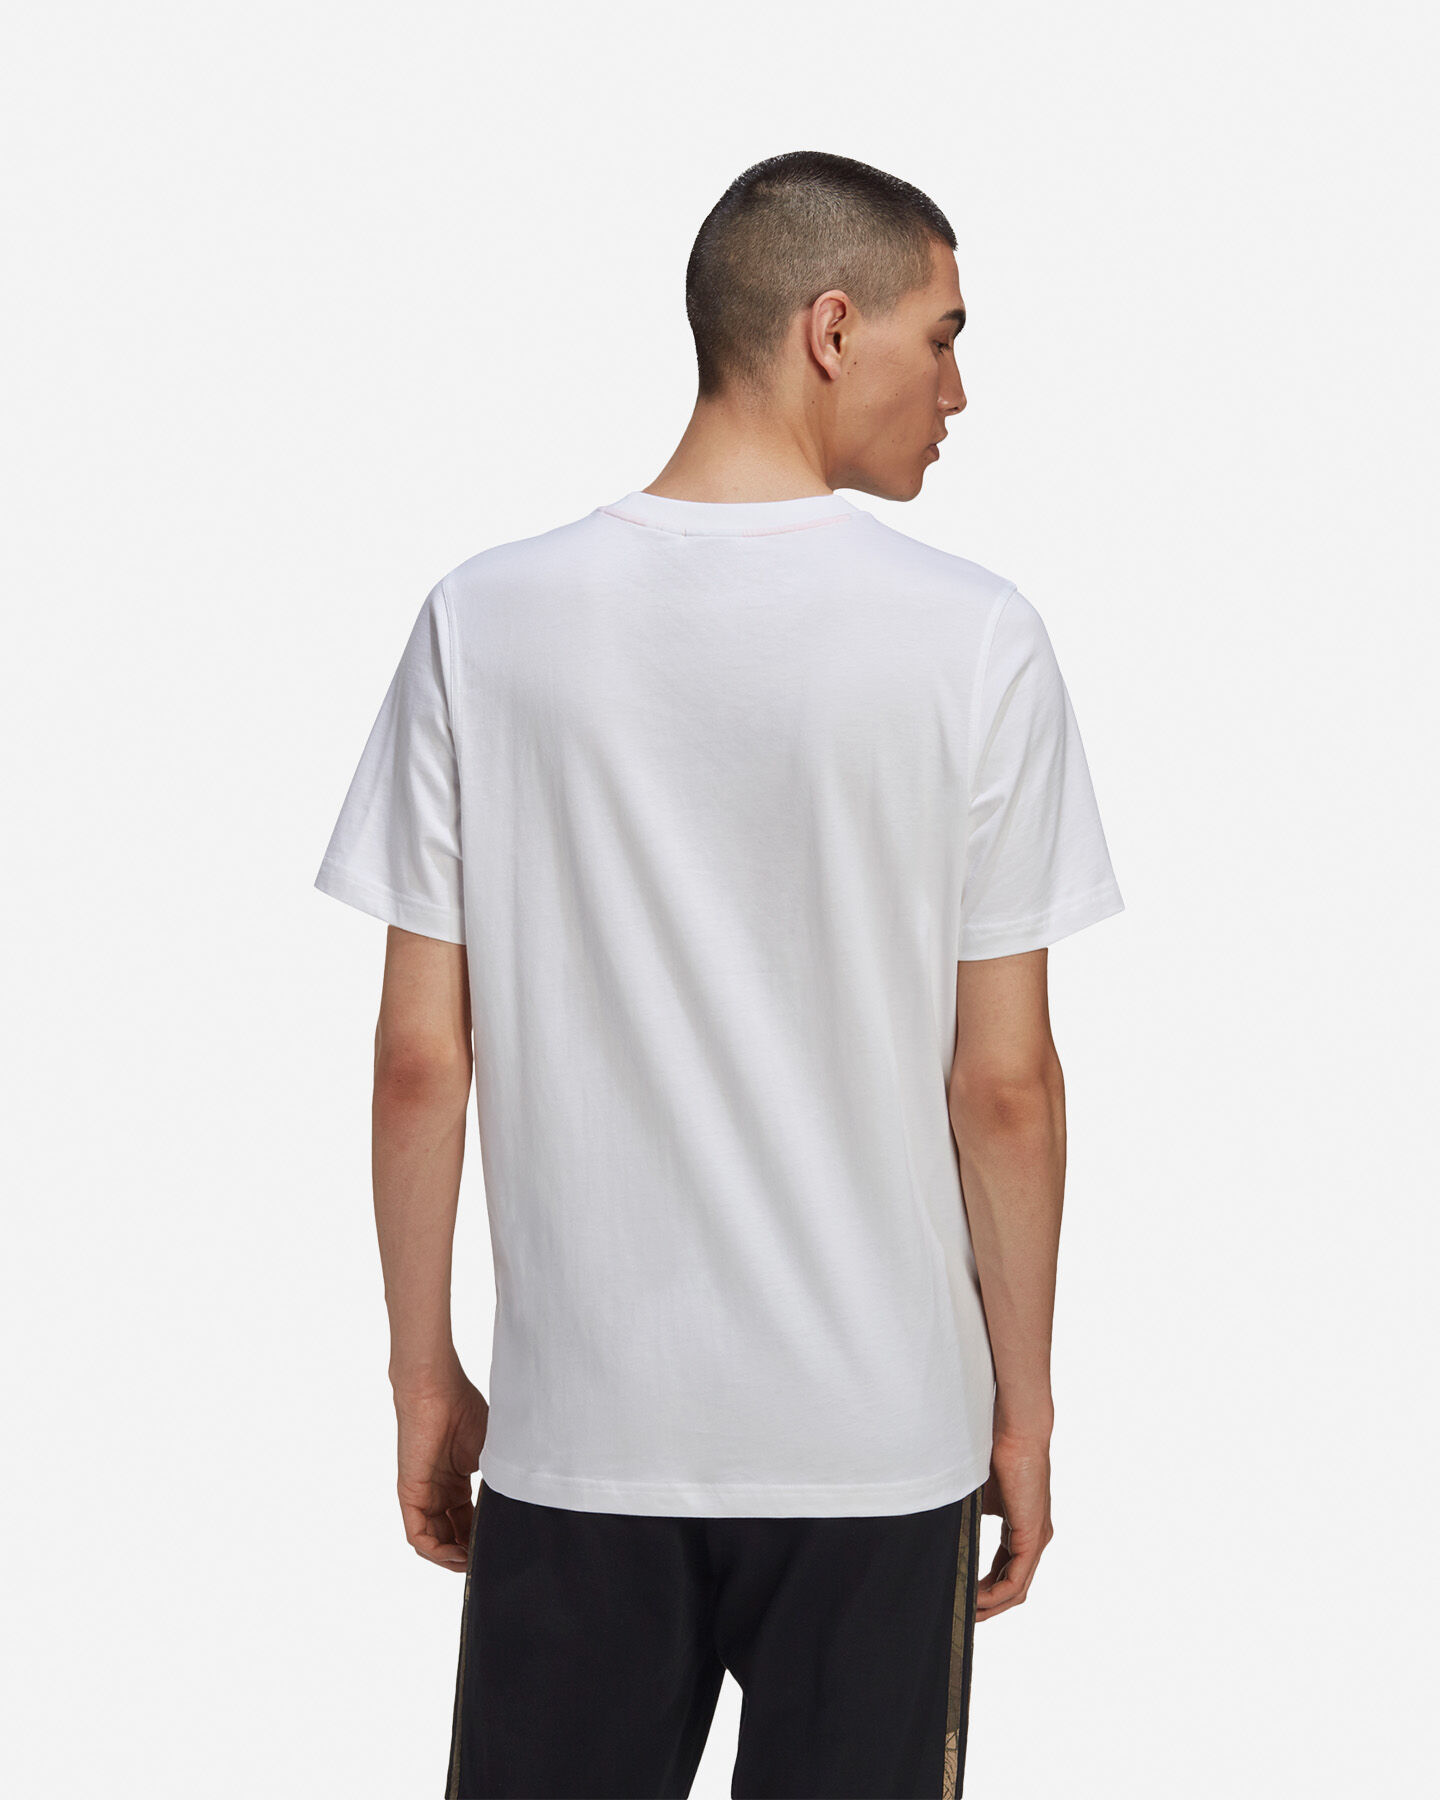 T-Shirt ADIDAS CAMO TREFOIL M S5210679 scatto 4